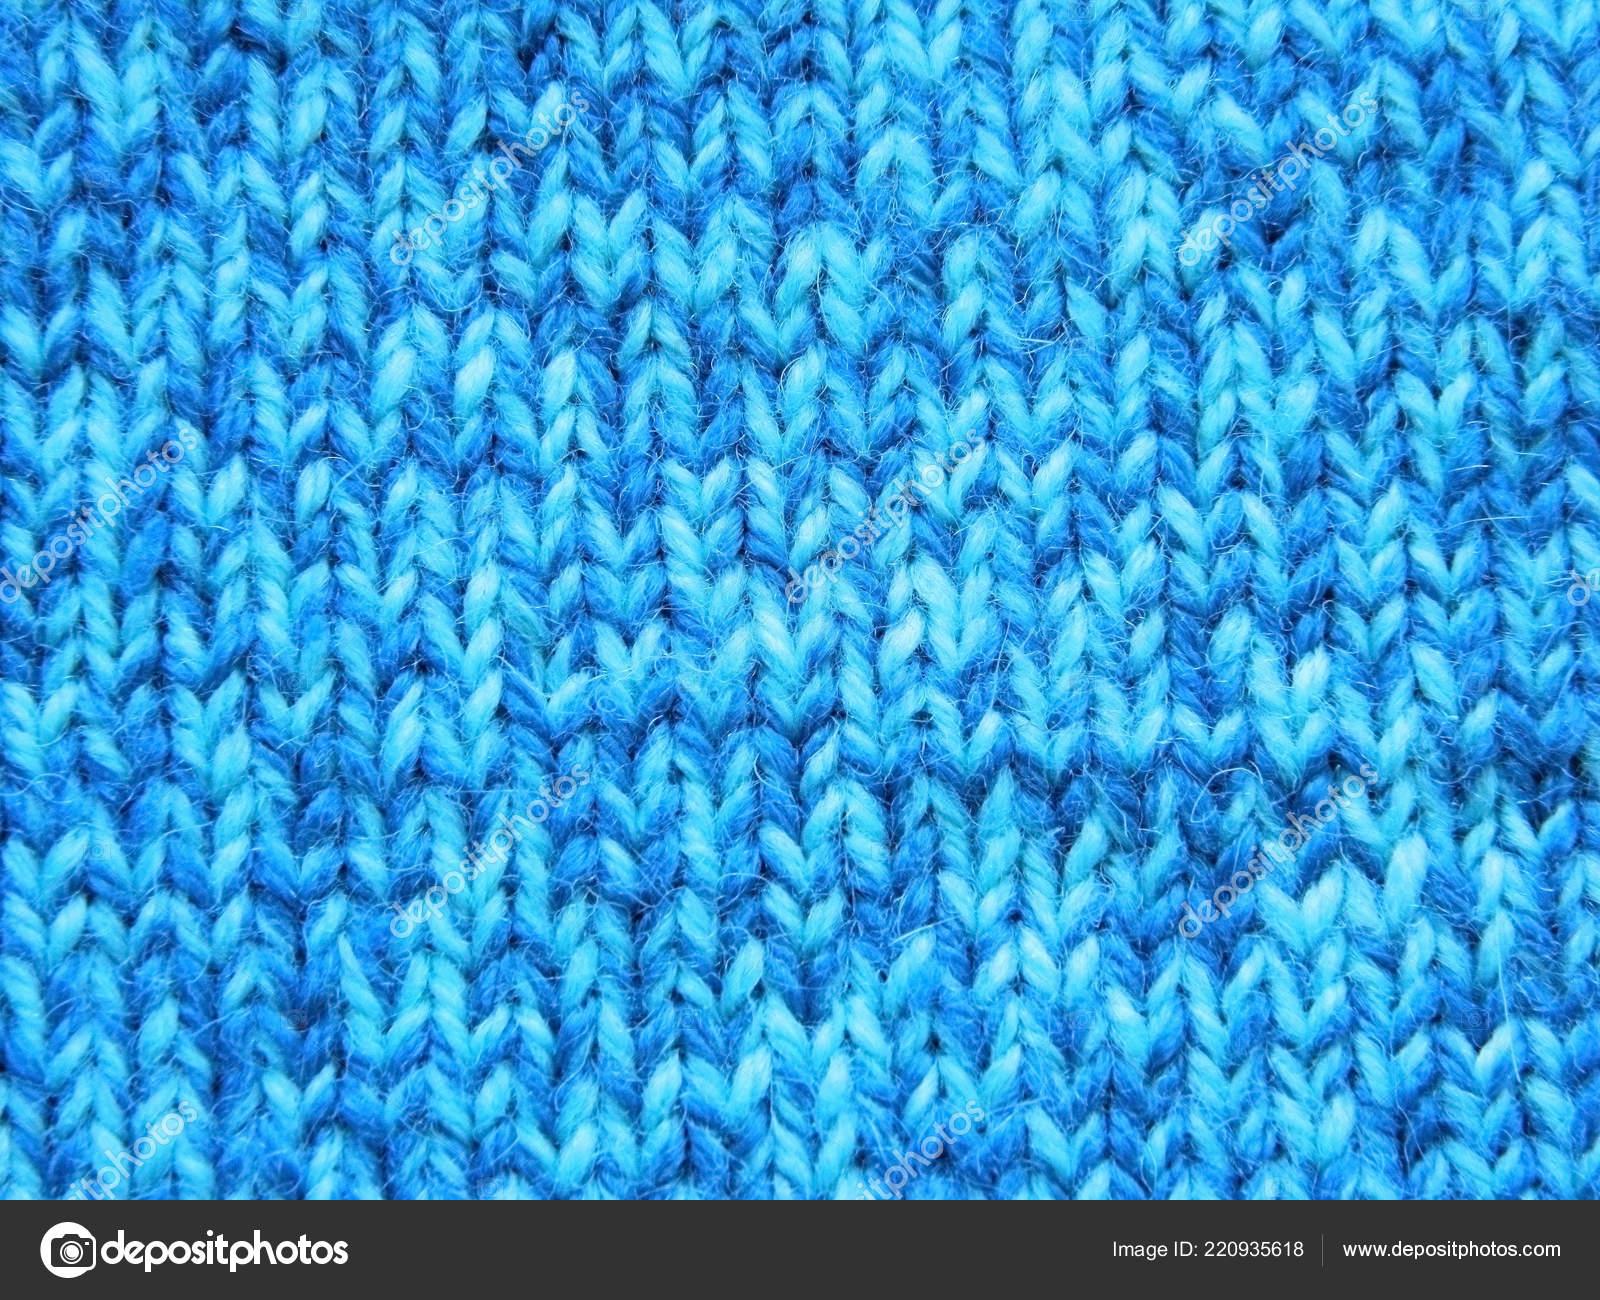 e065c87364 Πλεκτό Πλέξιμο Βελόνες Πλεξίματος — Φωτογραφία Αρχείου © shaydula ...